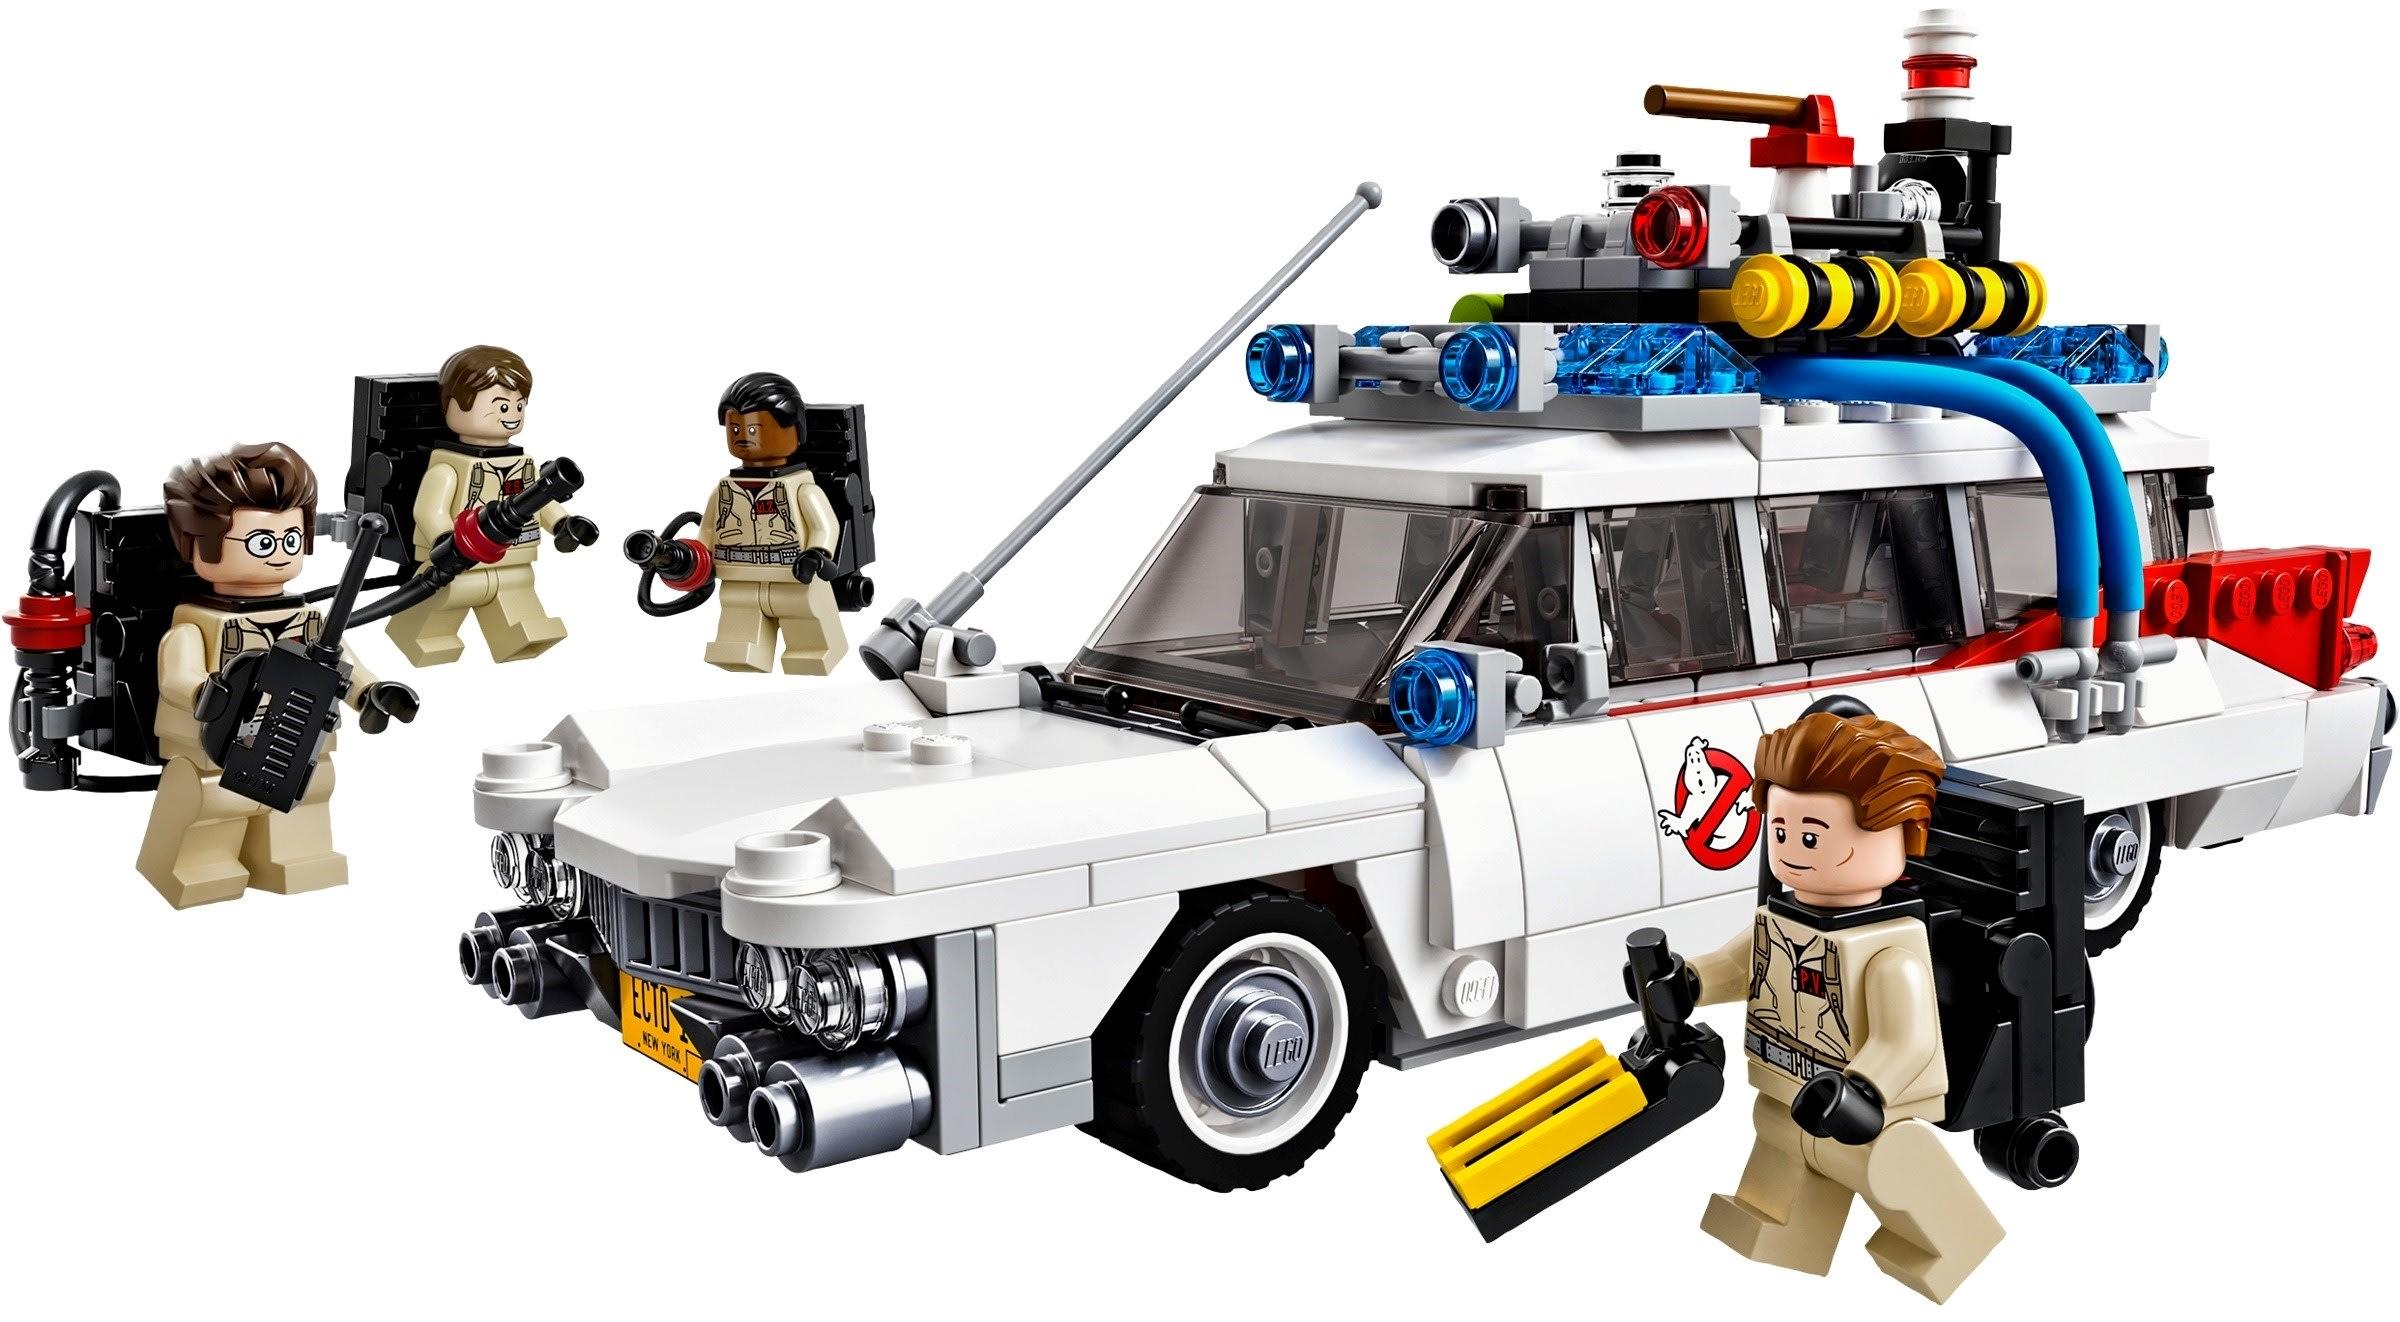 https://www.lego.com/en-us/product/ghostbusters-ecto-1-21108